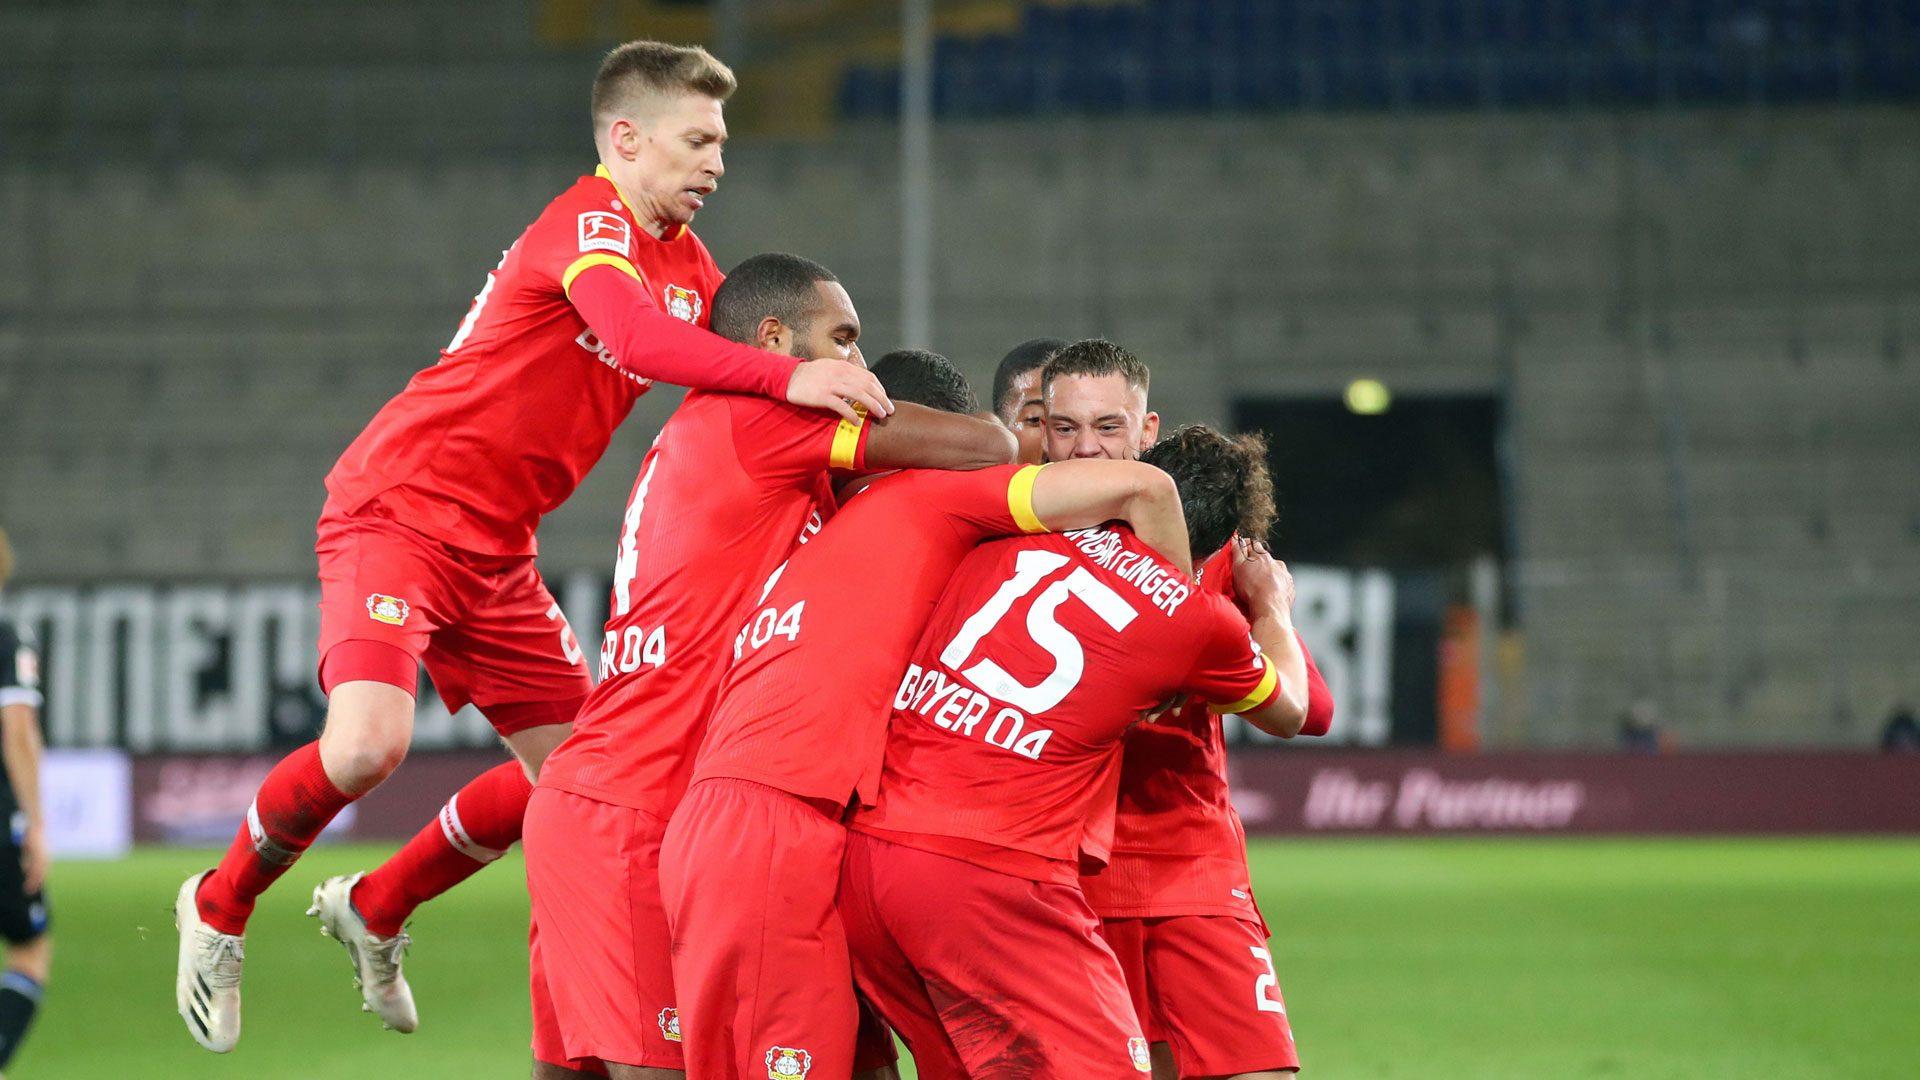 Bundesliga | Aleksandar Dragovic snatches late winner as Bayer Leverkusen  see off Arminia Bielefeld